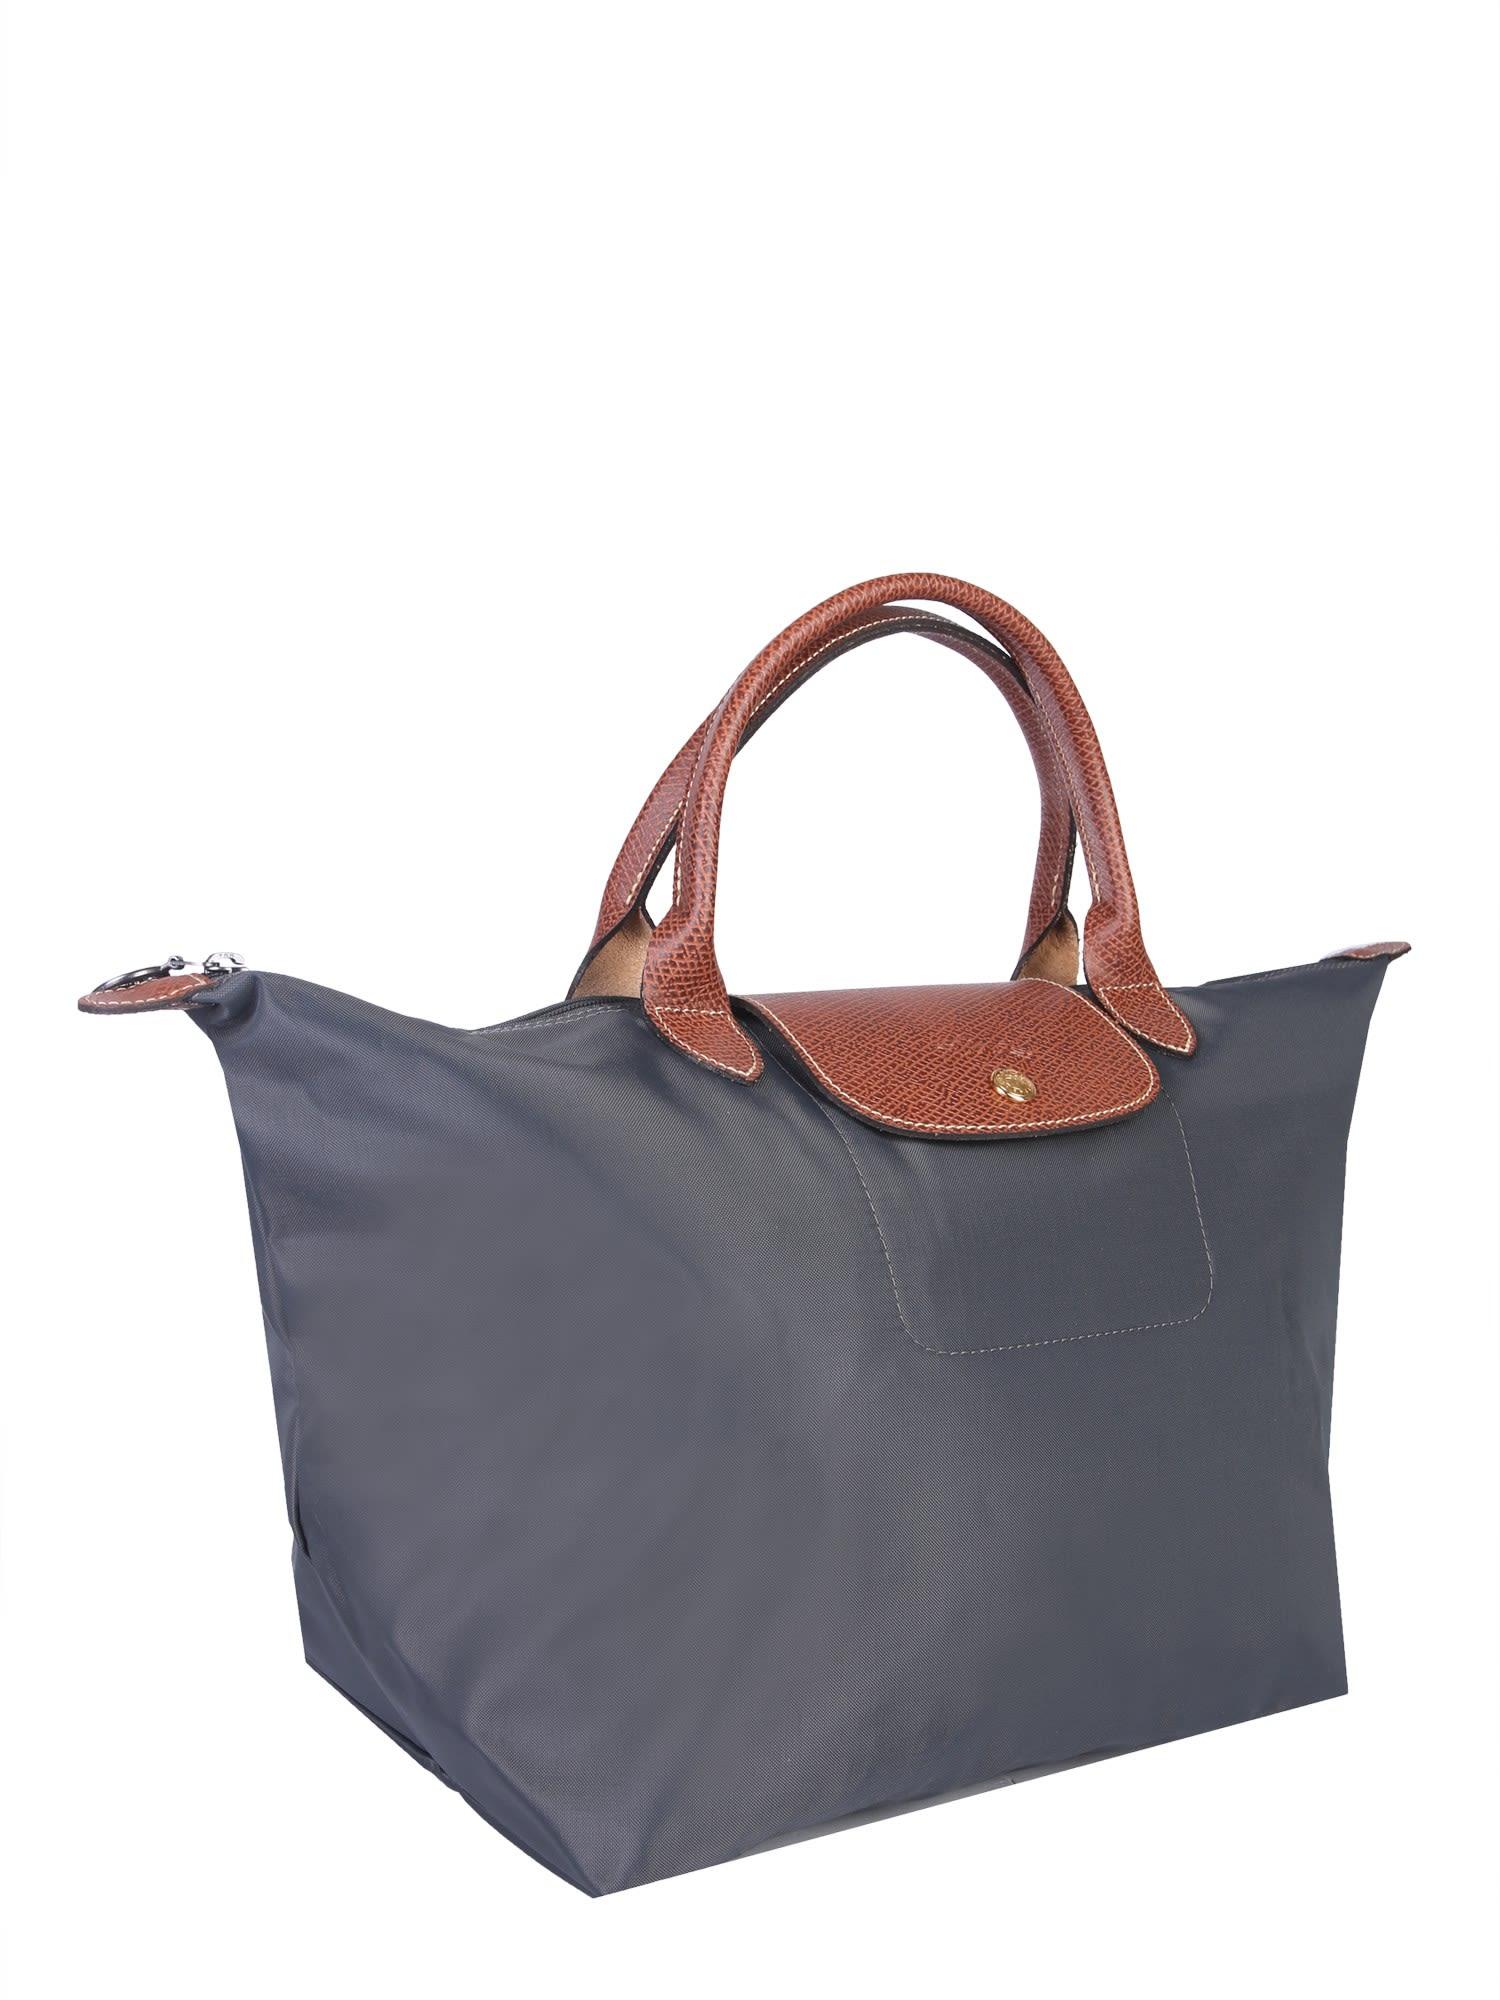 2d9ecf8116d Longchamp Longchamp Medium Le Pliage Bag - GRIGIO - 10790042 | italist